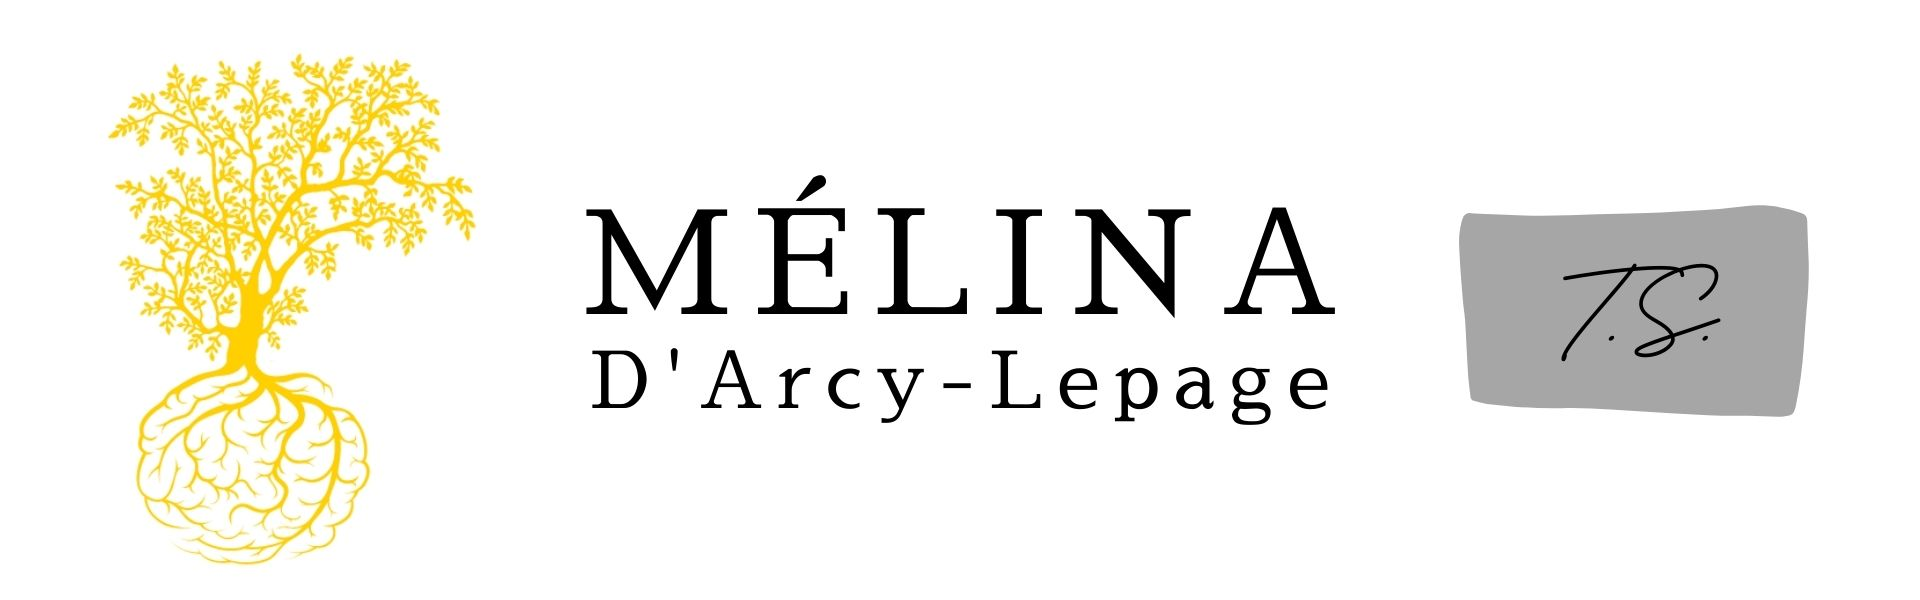 Mélina D'Arcy-Lepage, T.S. Pratique Privée